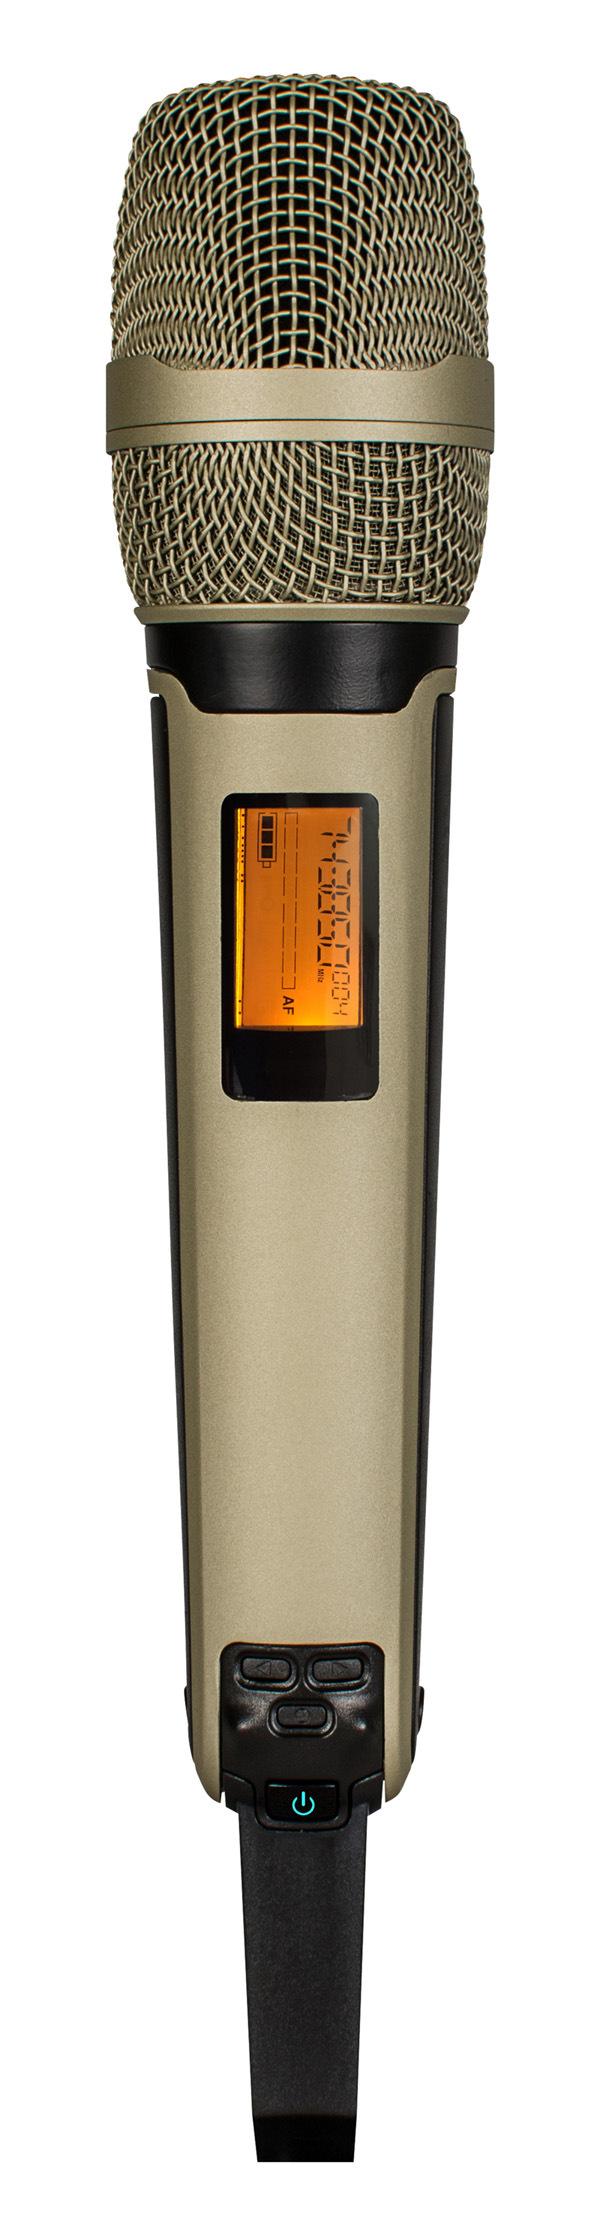 Golden Colour Beautiful Wireless Microphone GS-928